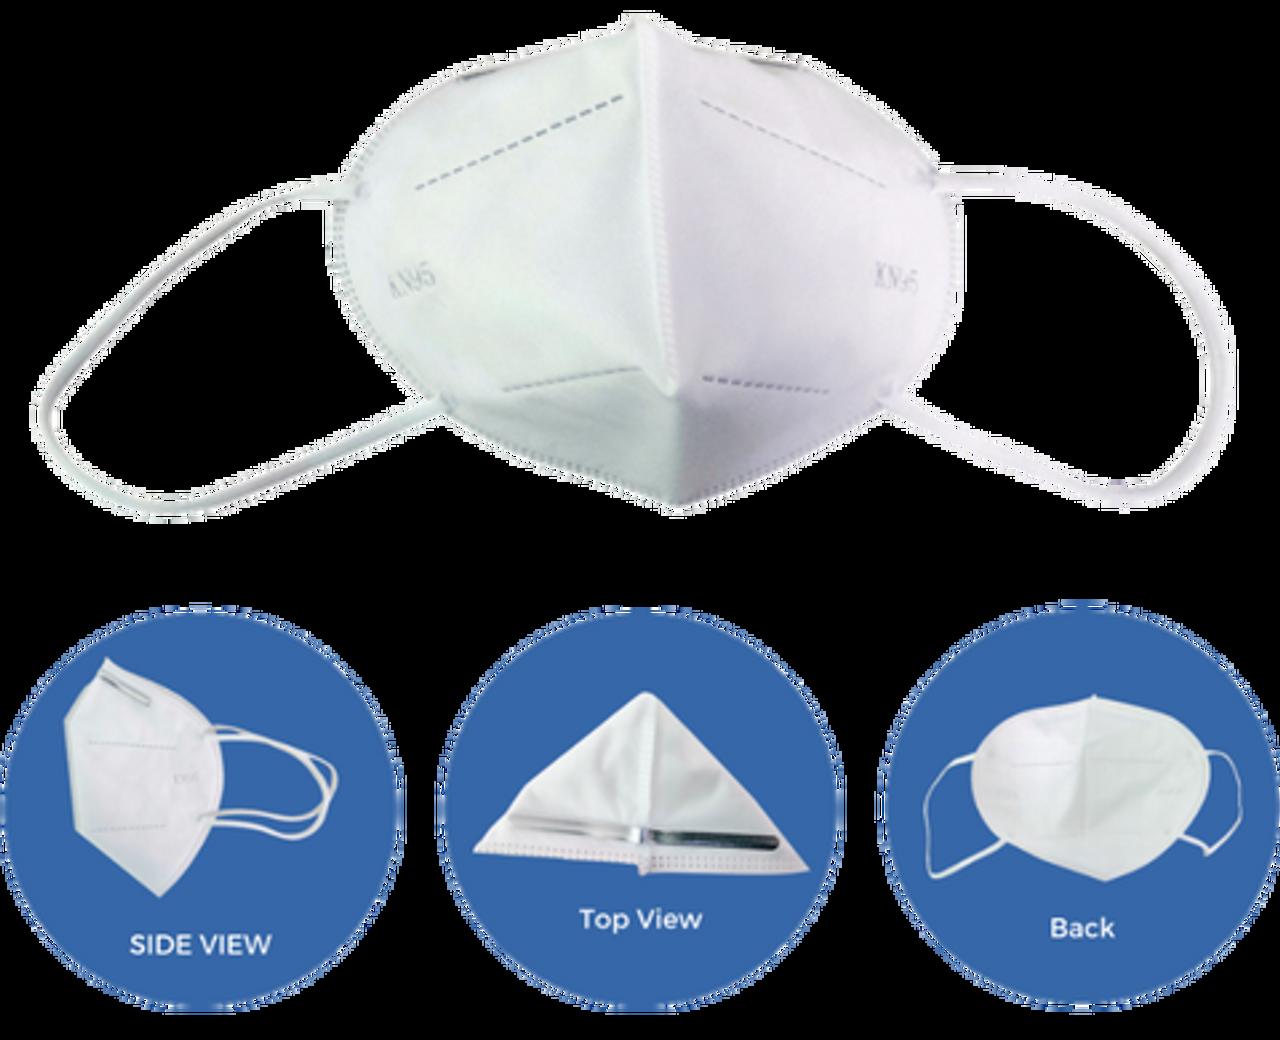 KN95 Disposable Half Face Dust Mask - 5/pk